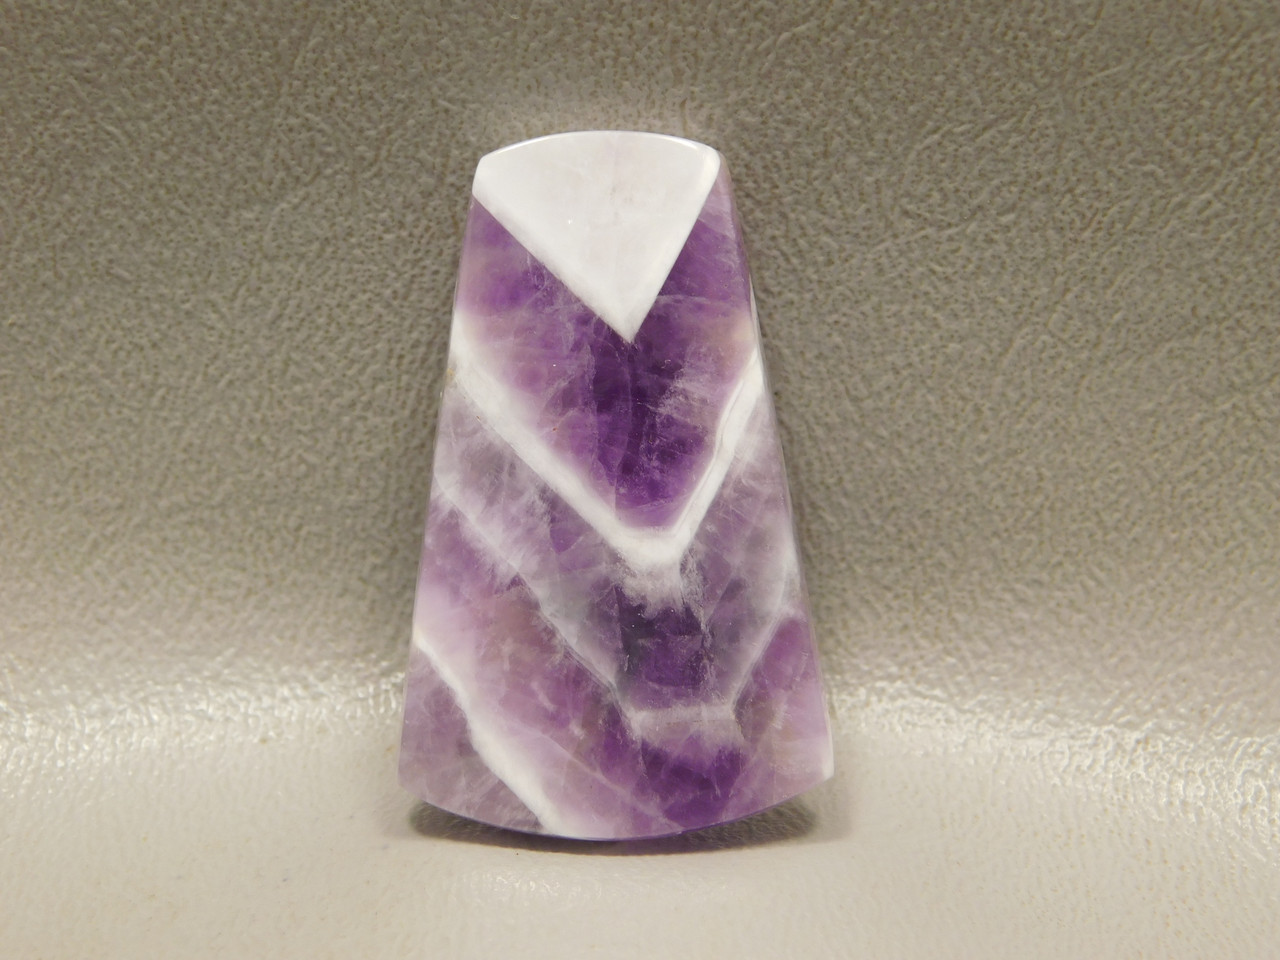 Chevron Amethyst Cabochon Purple Stone Jewelry Making #15